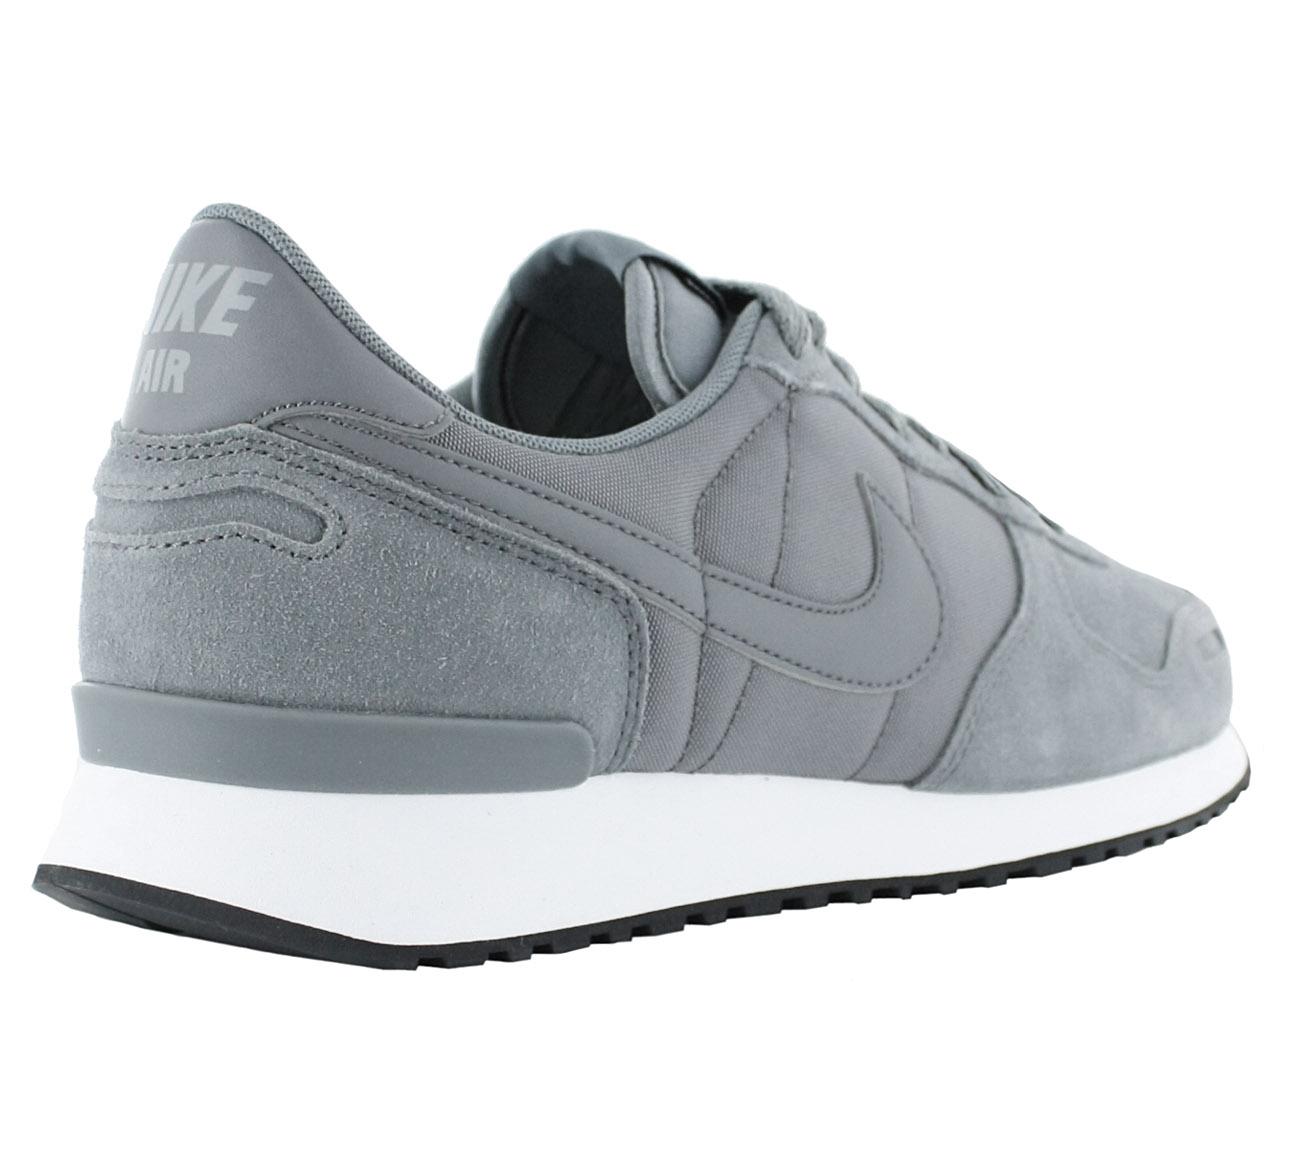 sports shoes a8318 a6c57 Nike Air Vortex Leather Herren Schuhe Grau